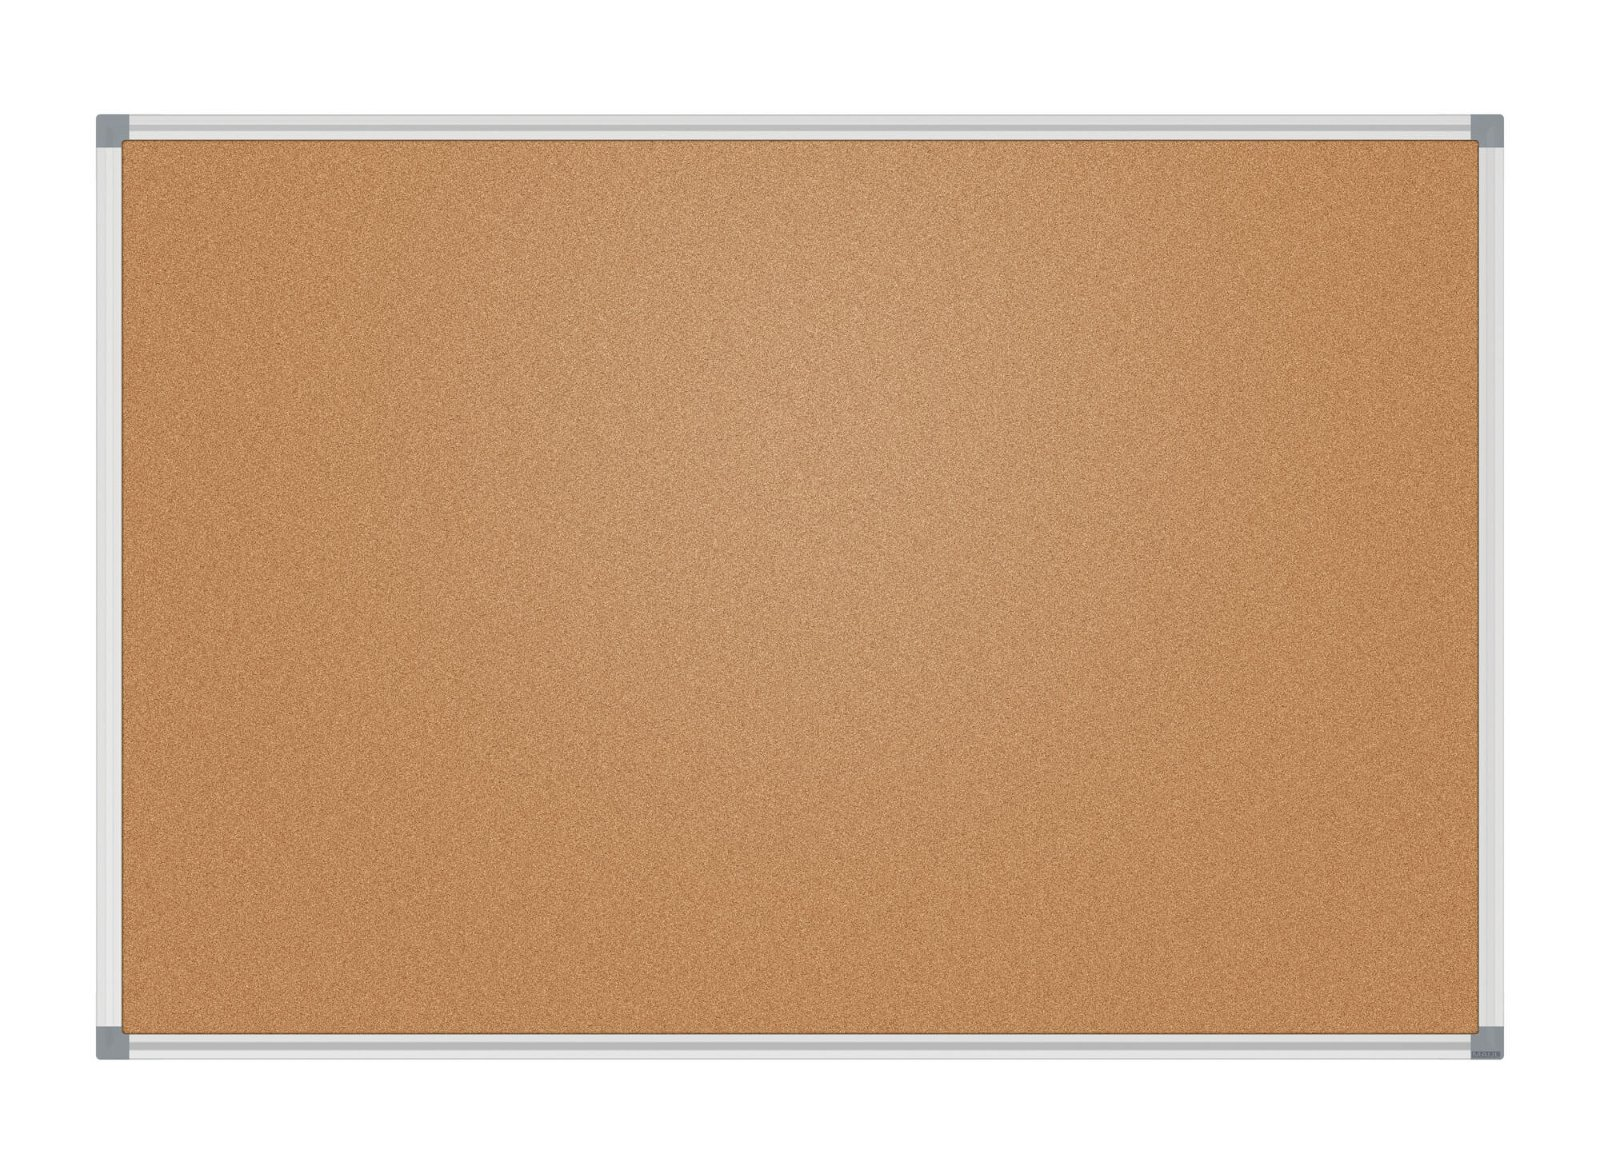 Pinnboard MAULstandard, 45x60 cm, Kork, SB-Verpackung, grau